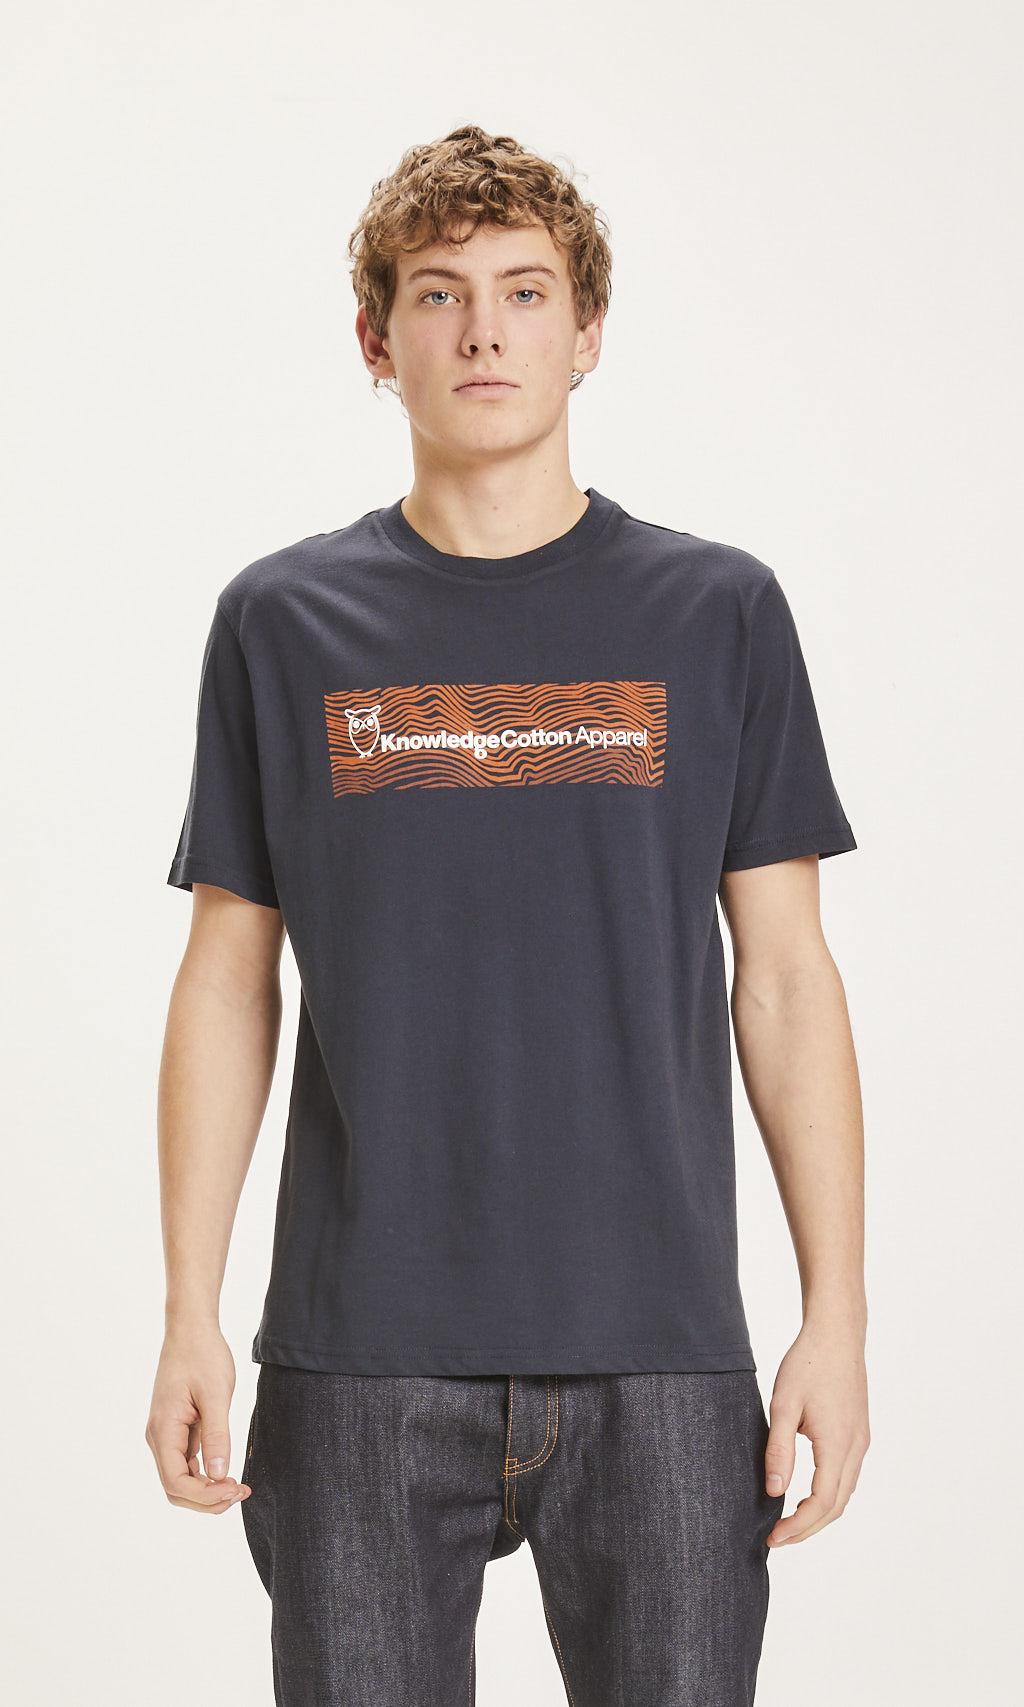 T-shirt marque KCA - Knowledge Cotton Apparel